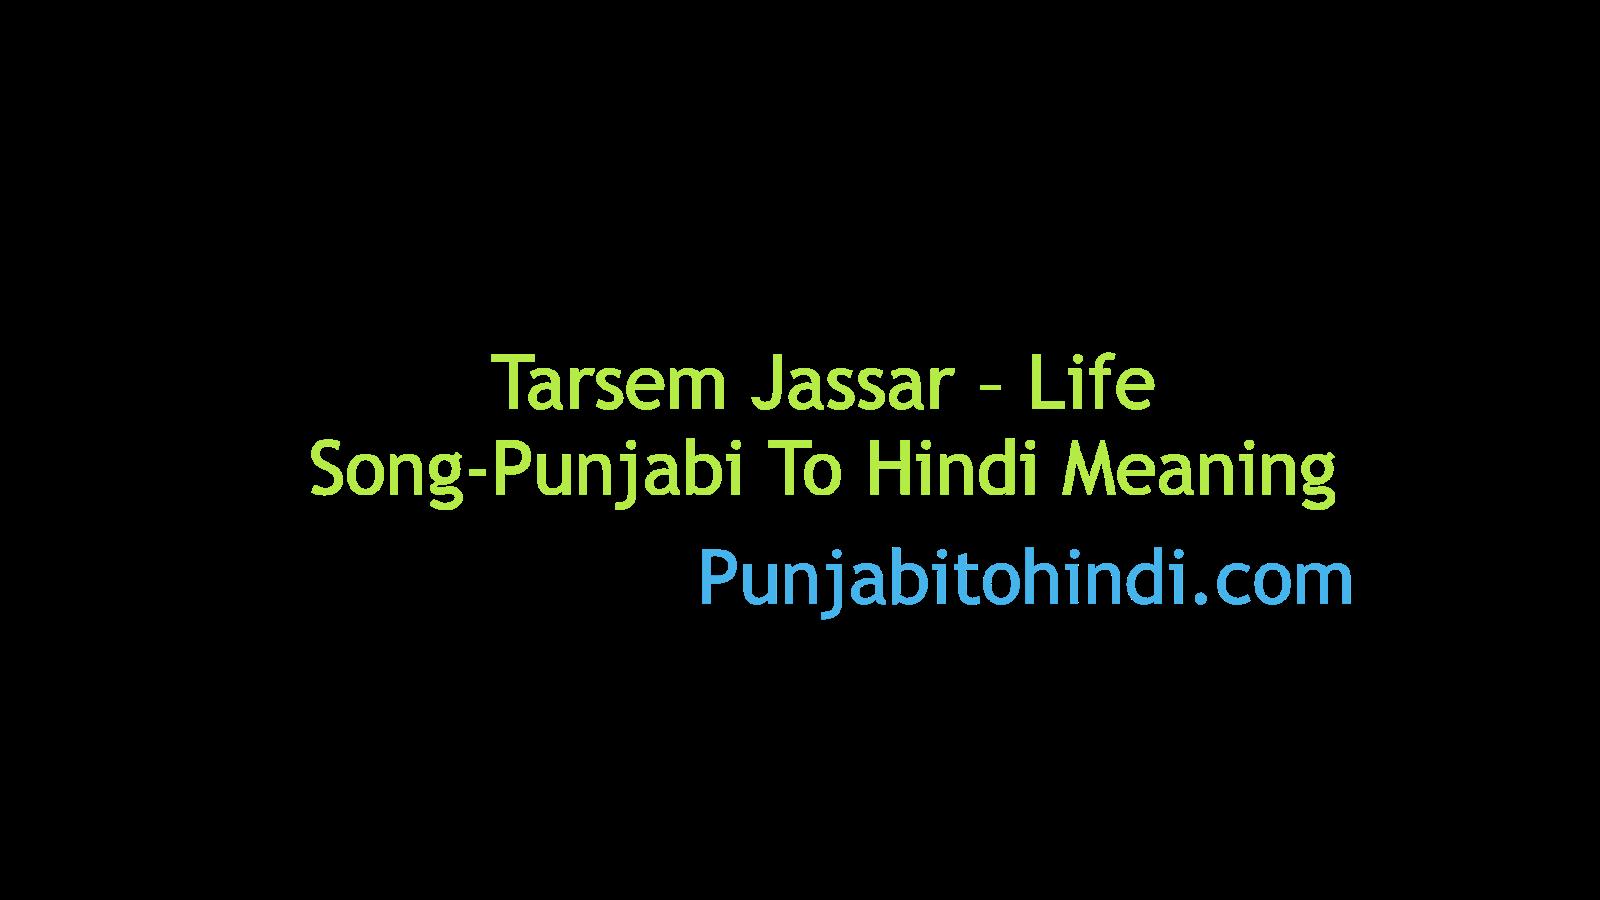 TARSEM JASSAR LIFE SONG LYRICS TRANSLATE IN HINDI